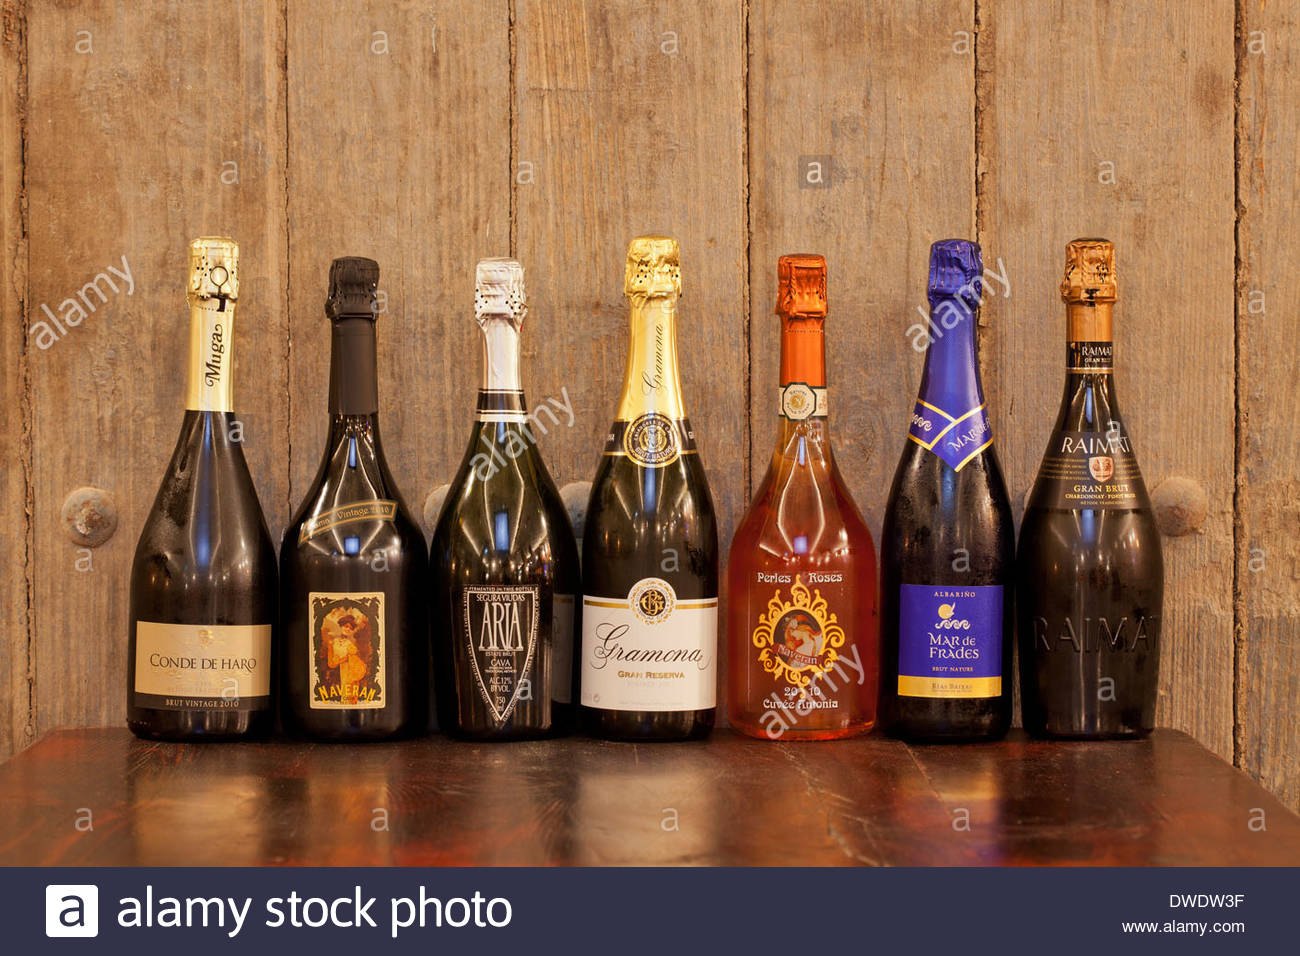 Restaurant Wall Display Wine Bottles Stockfotos & Restaurant Wall ...